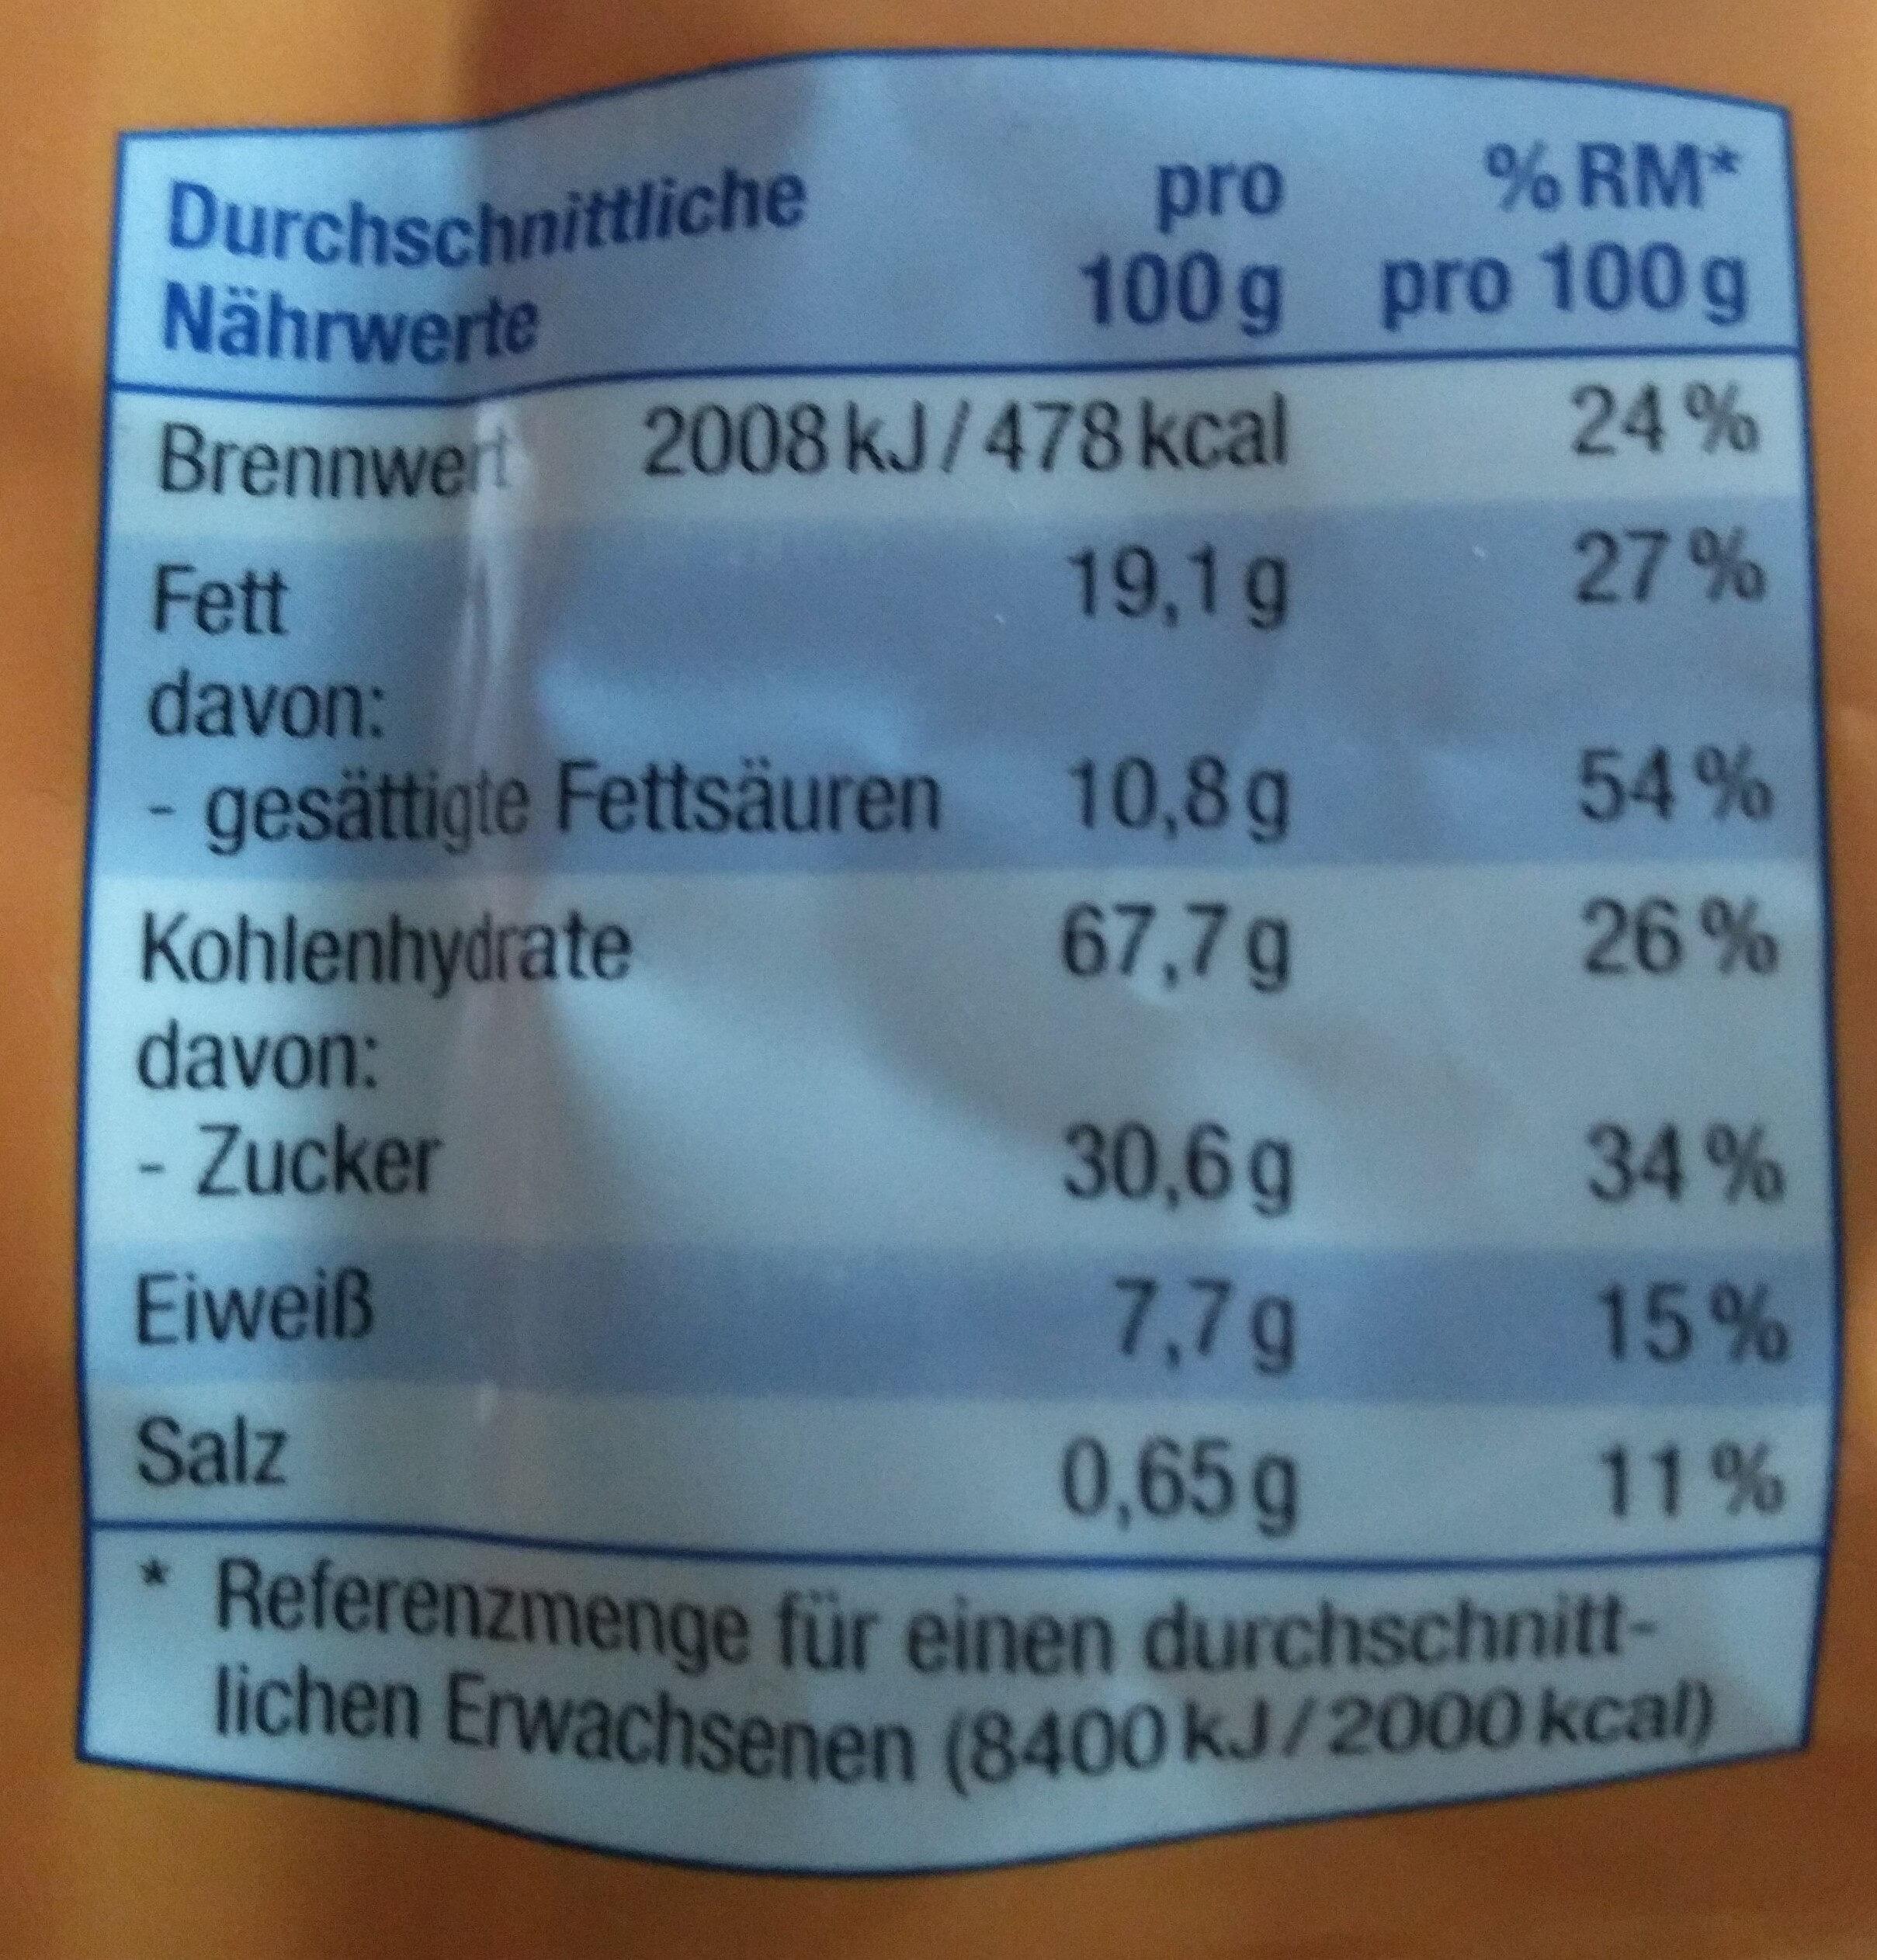 Mini Schokokekse (mit Vollmilchschokolade) - Nährwertangaben - de